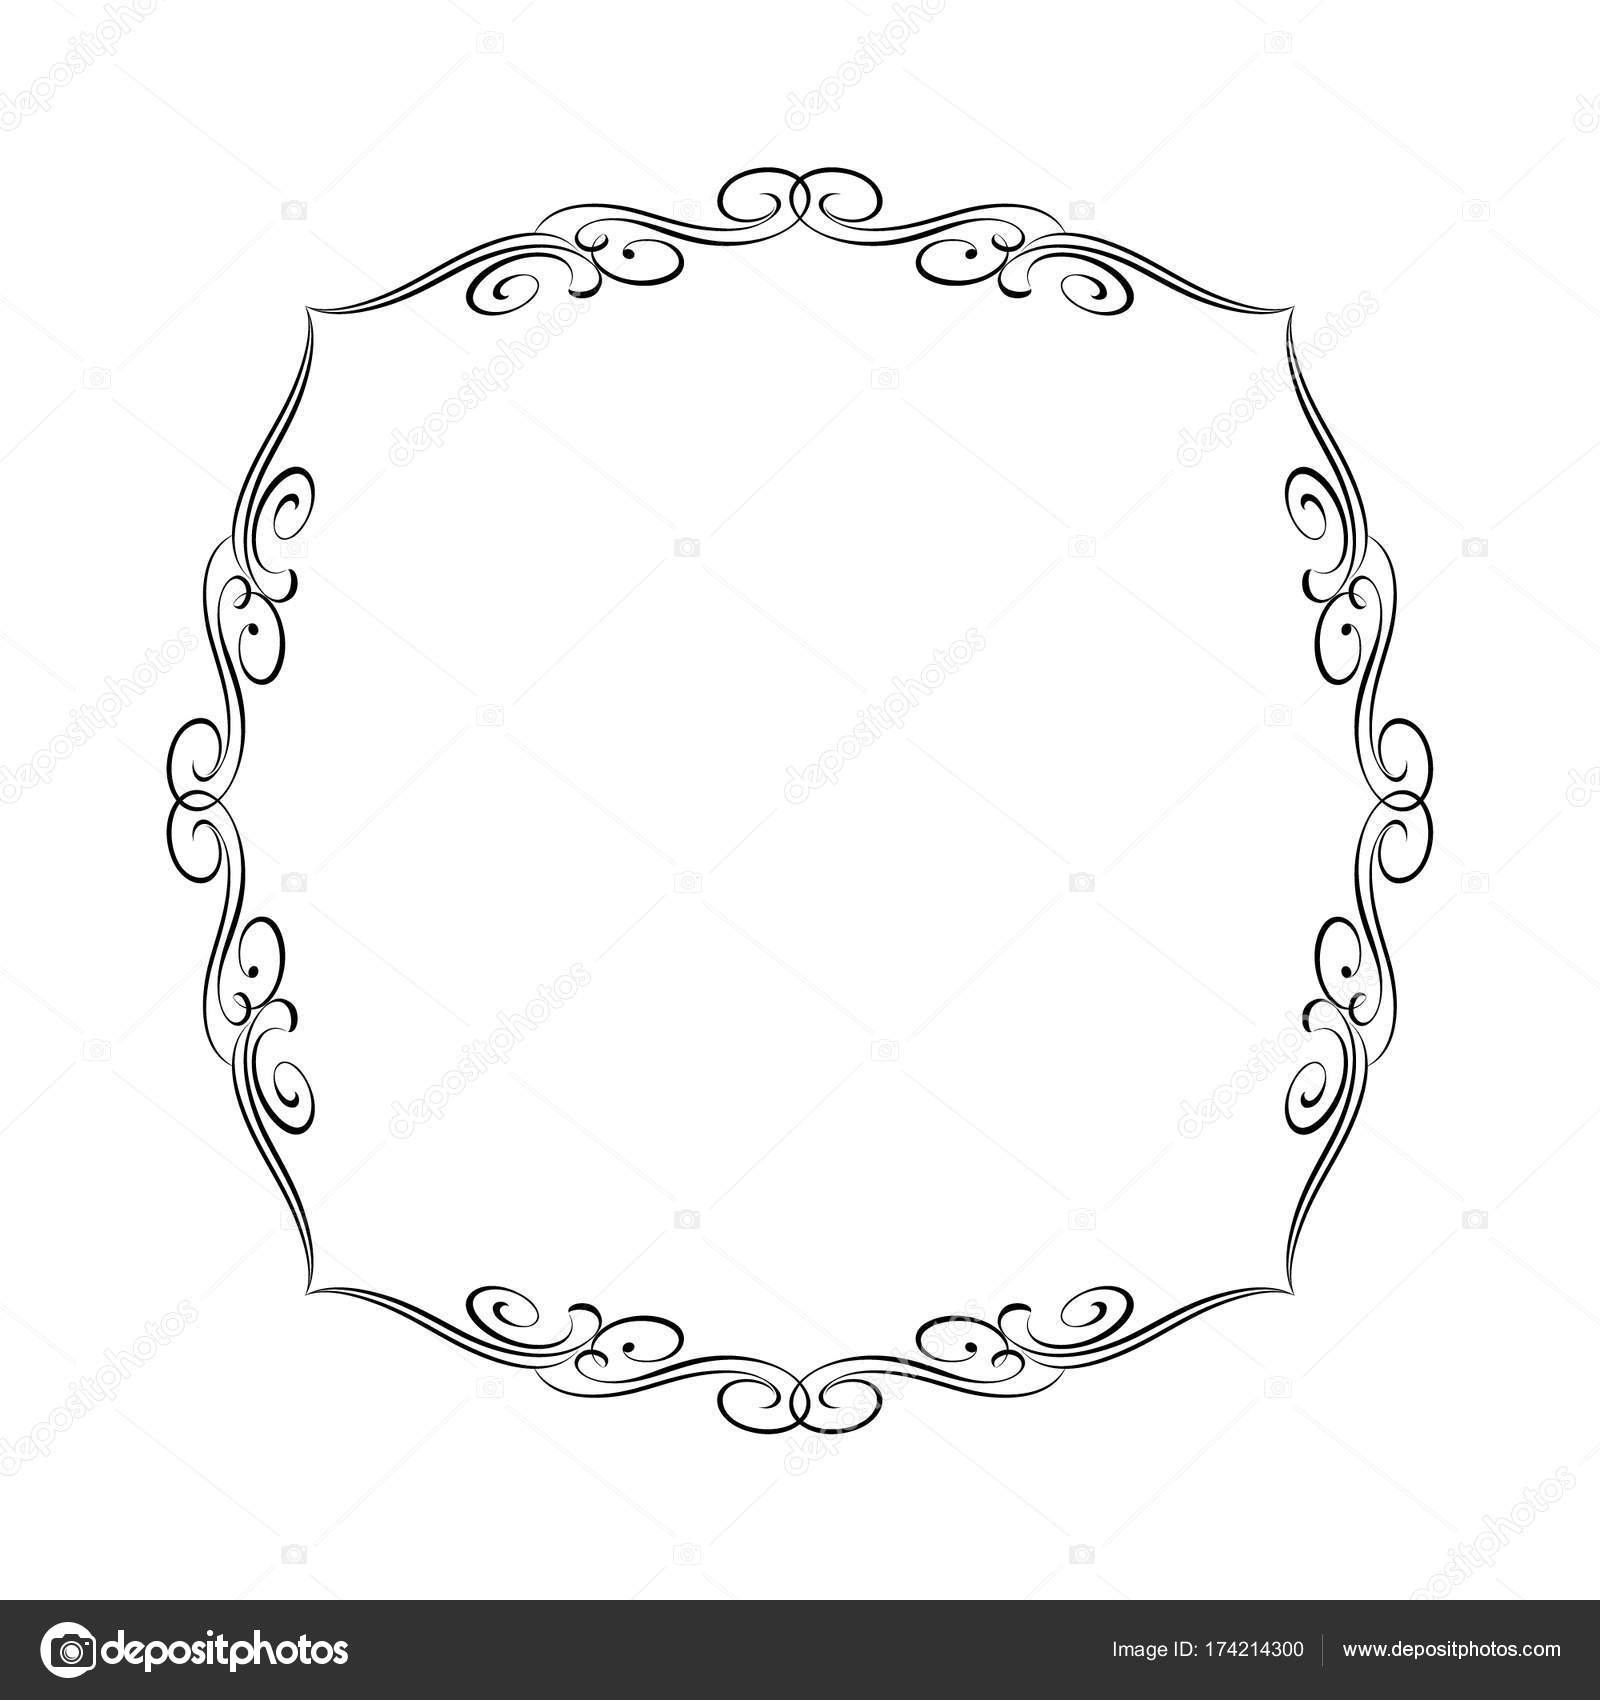 Dekorative Vektor Rahmen. Vektor-Illustration. Schwarz — Stockvektor ...